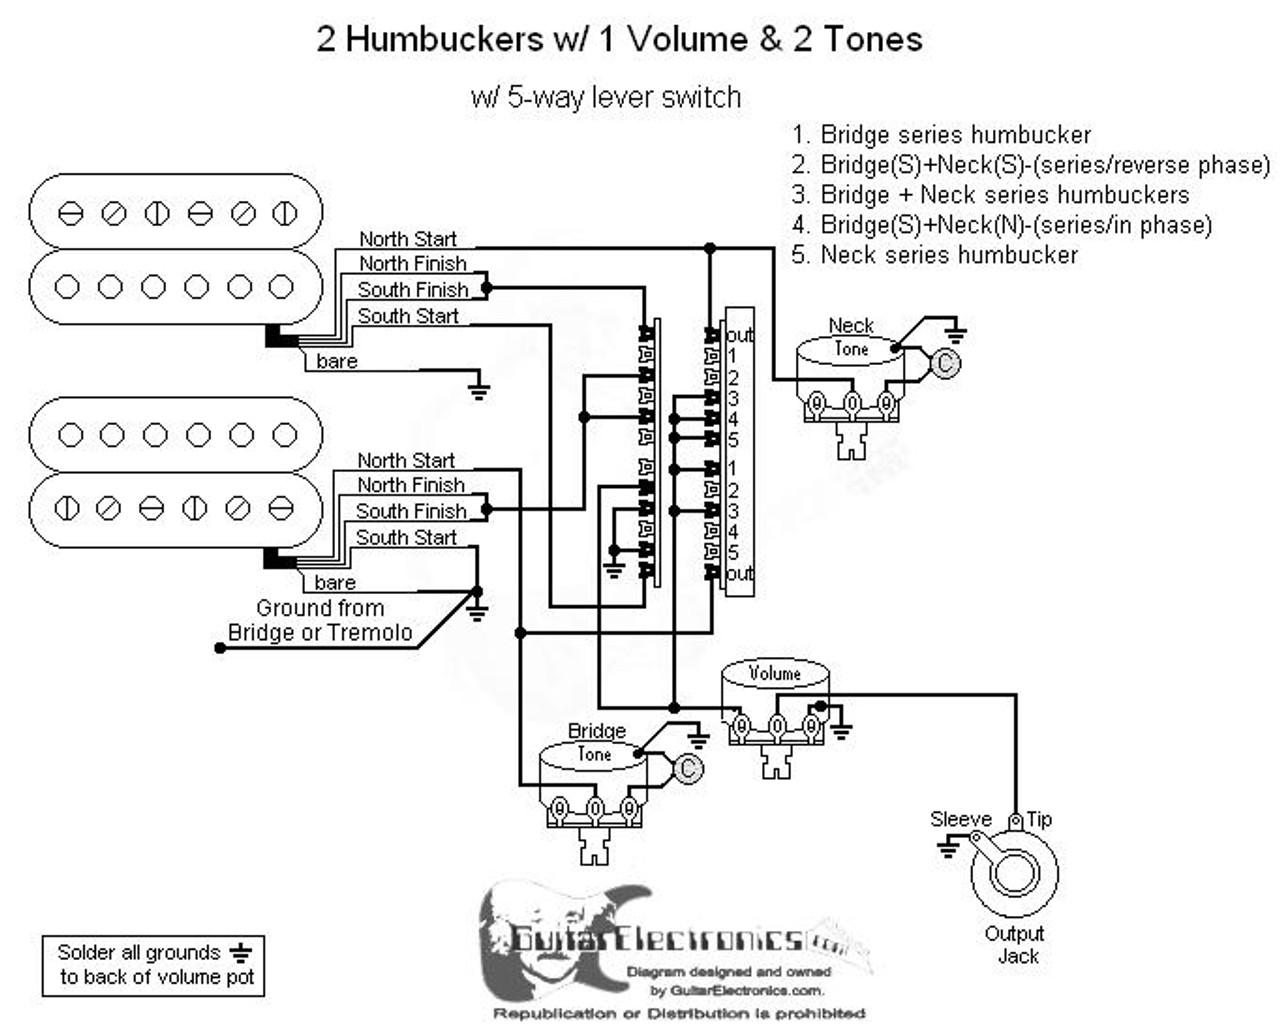 2 humbuckers 5 way lever switch 1 volume 2 tone 03wd2hh5l12_03__46181 1470694495 jpg?c\u003d2